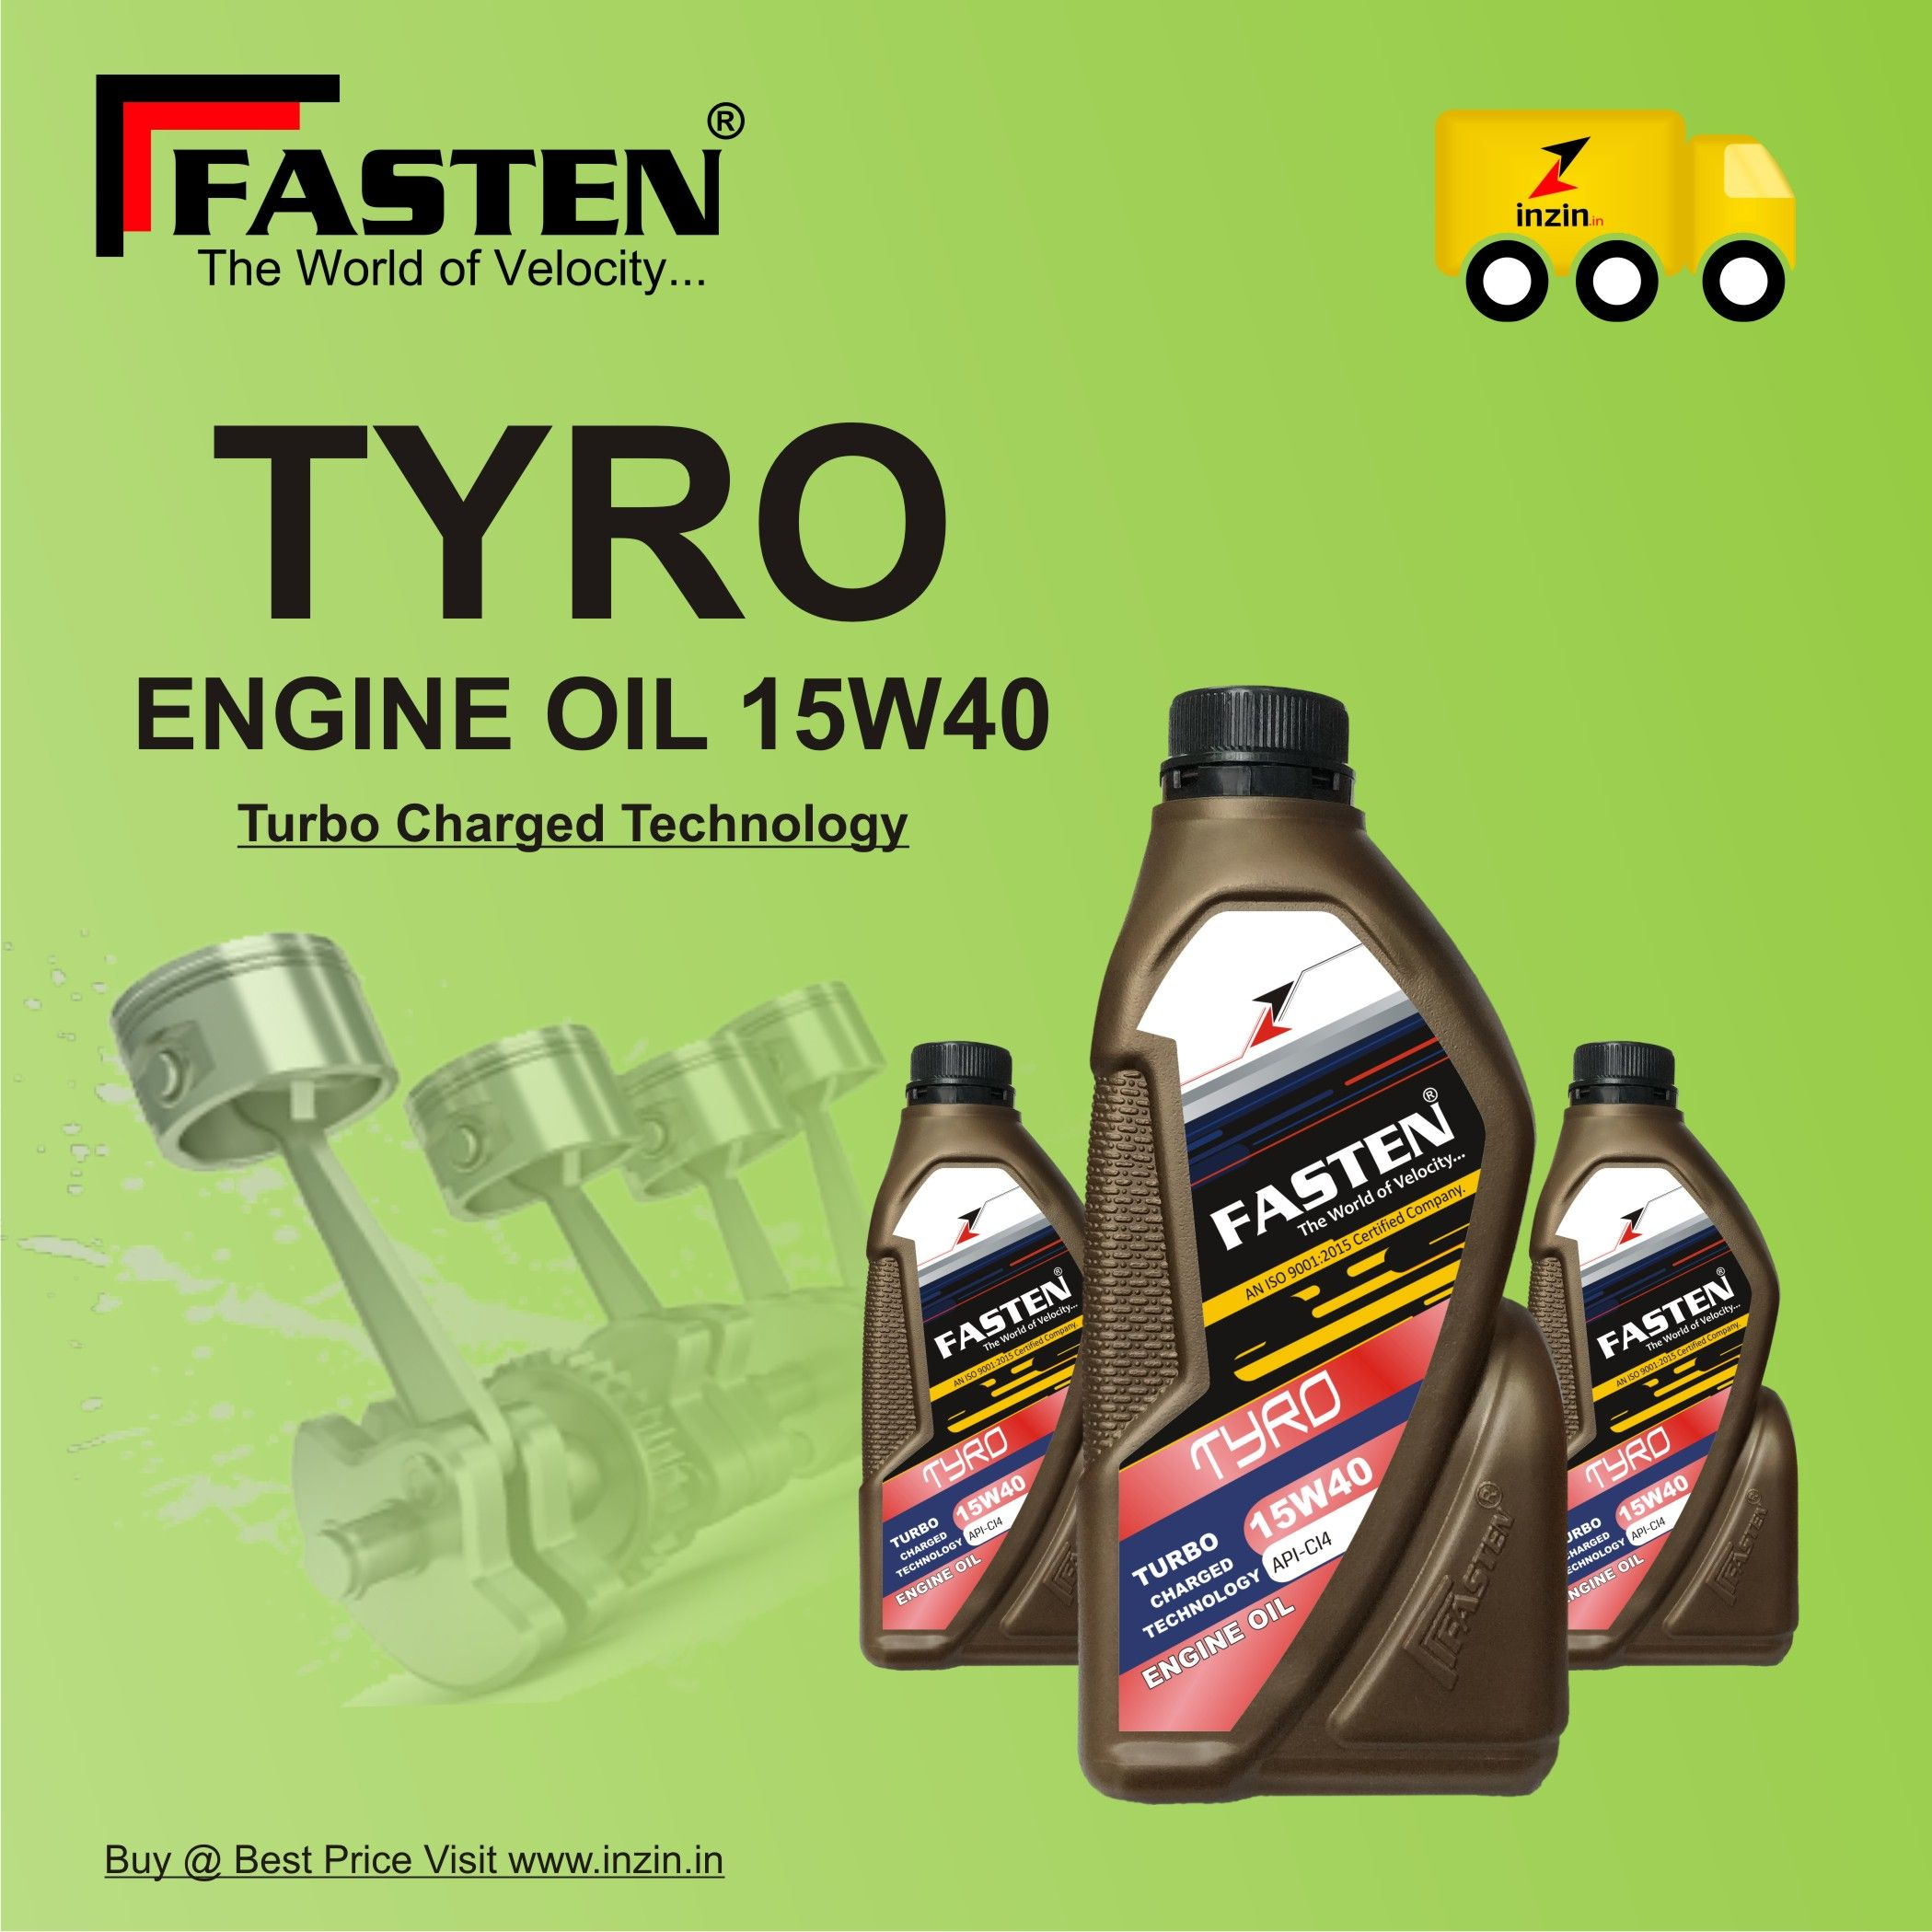 Tyro 15w40 Engine Oil Oils Oil Container Diesel Oil